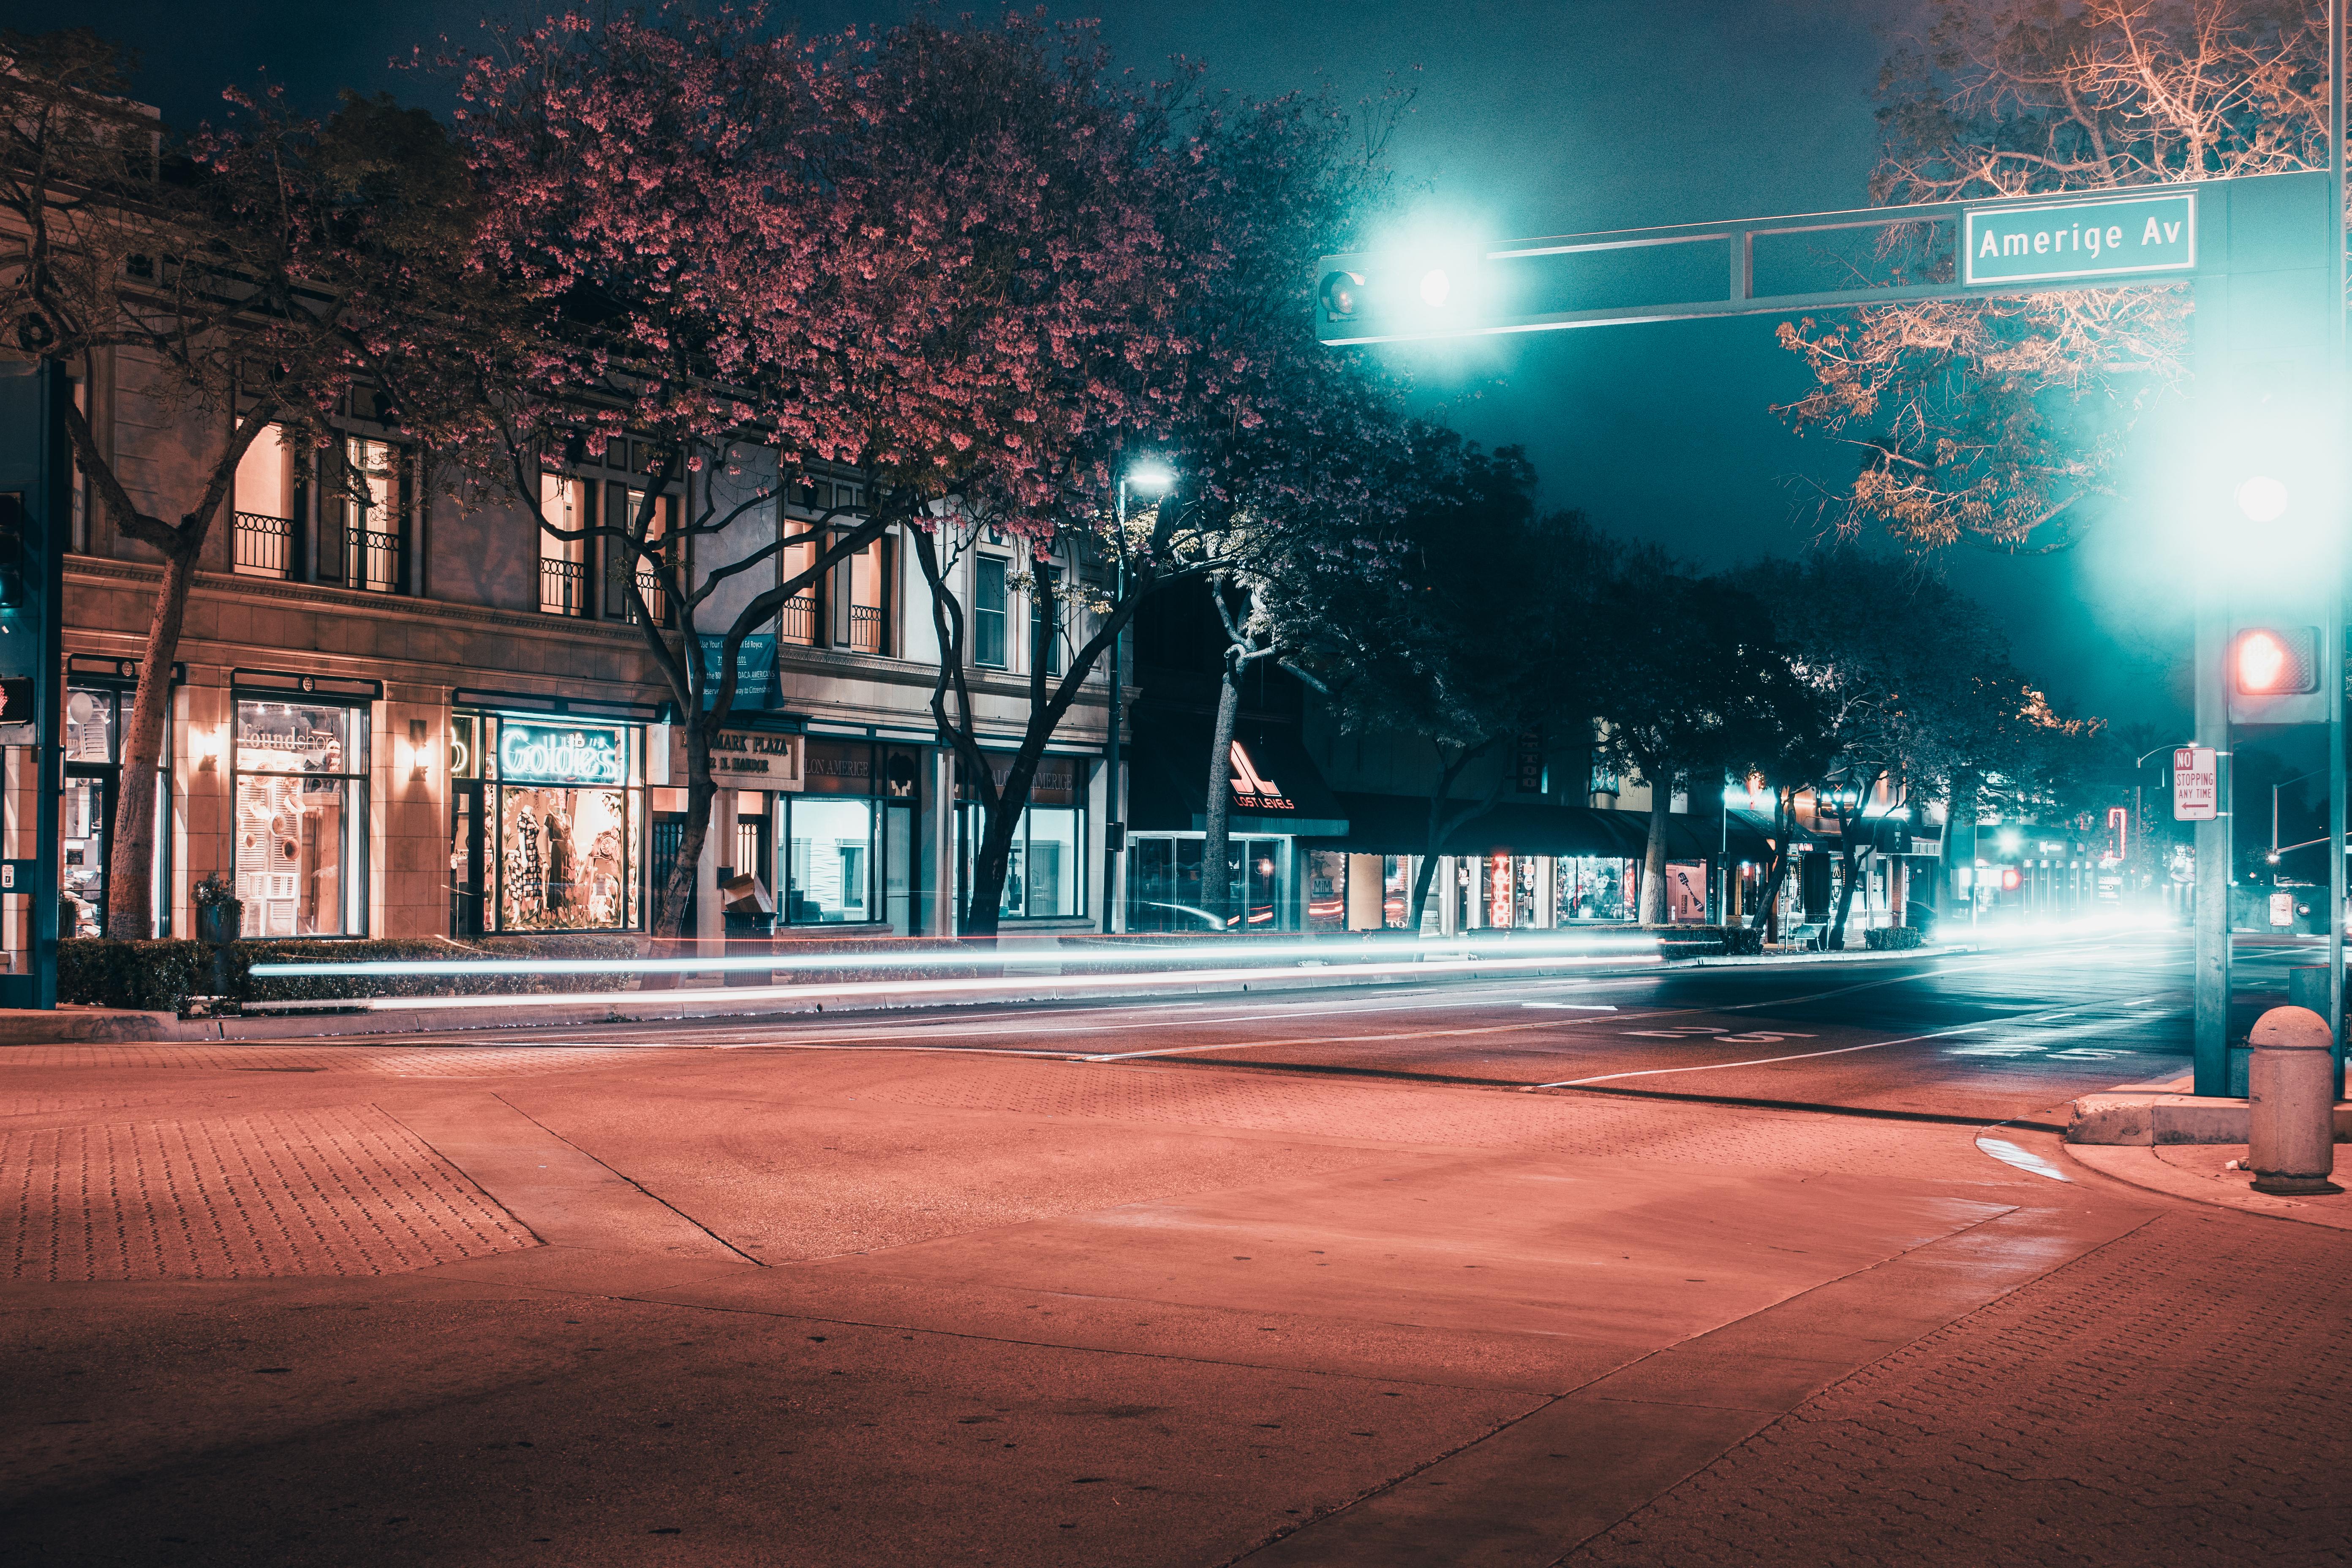 Amerige Street